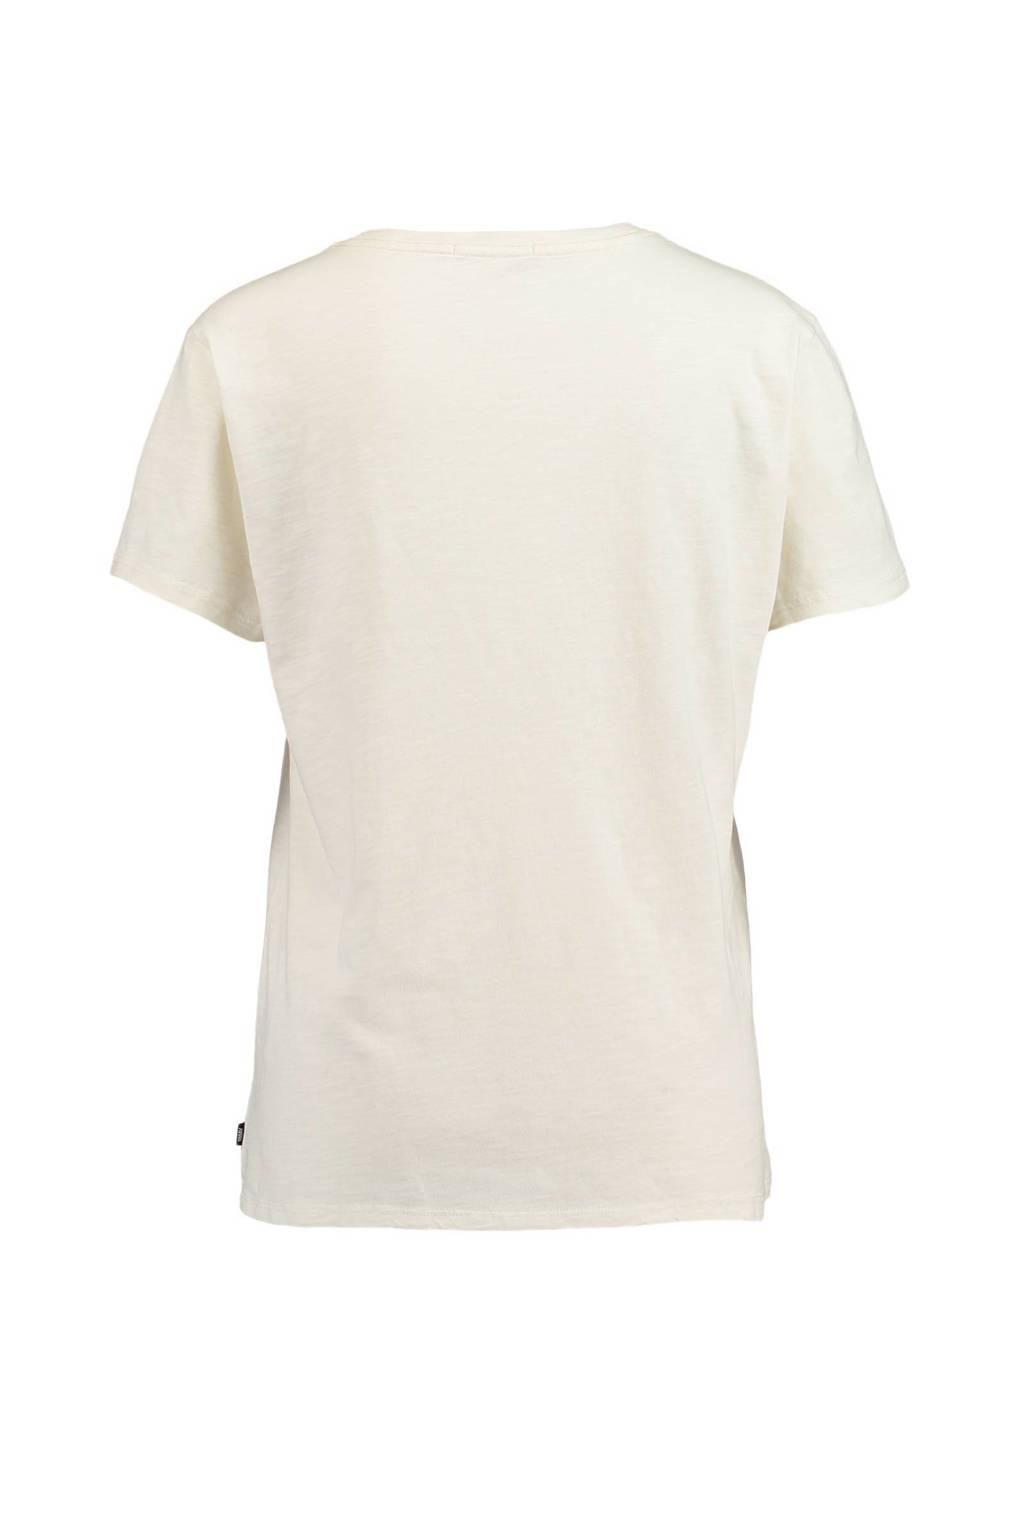 America Today T-shirt, Ecru/blauw